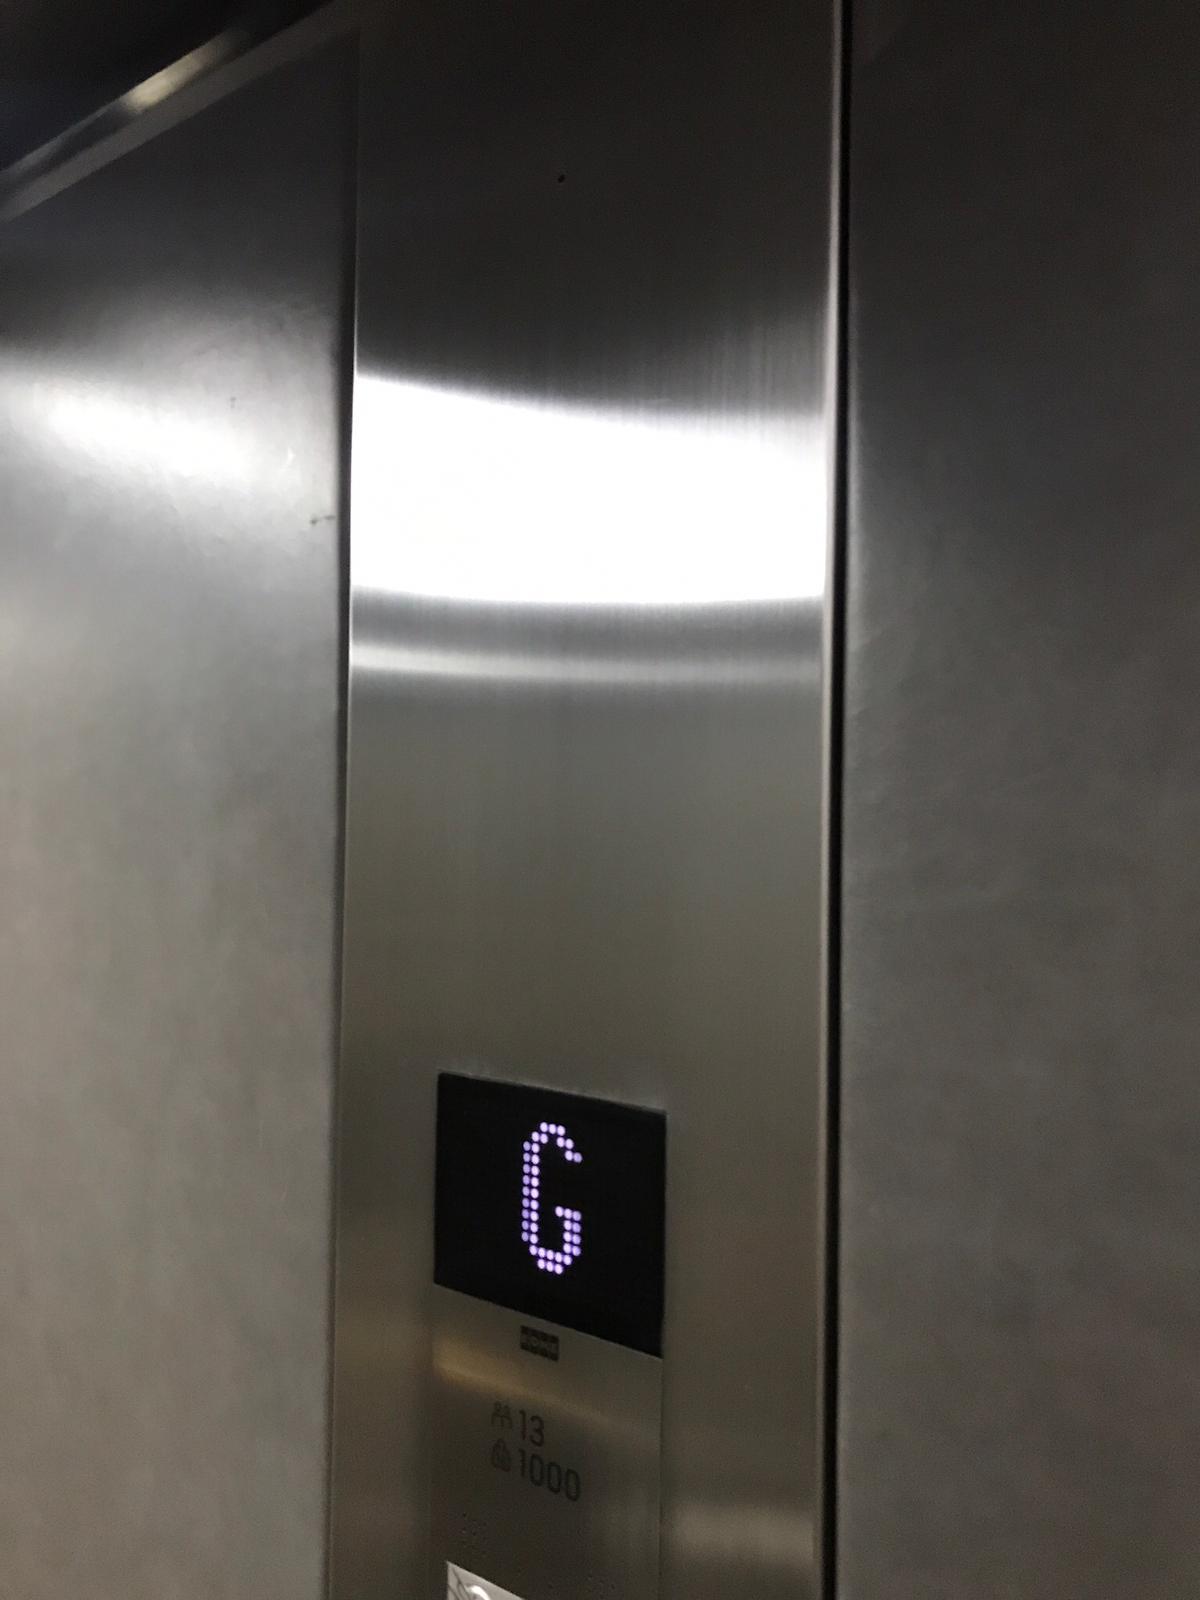 lift control panel restored